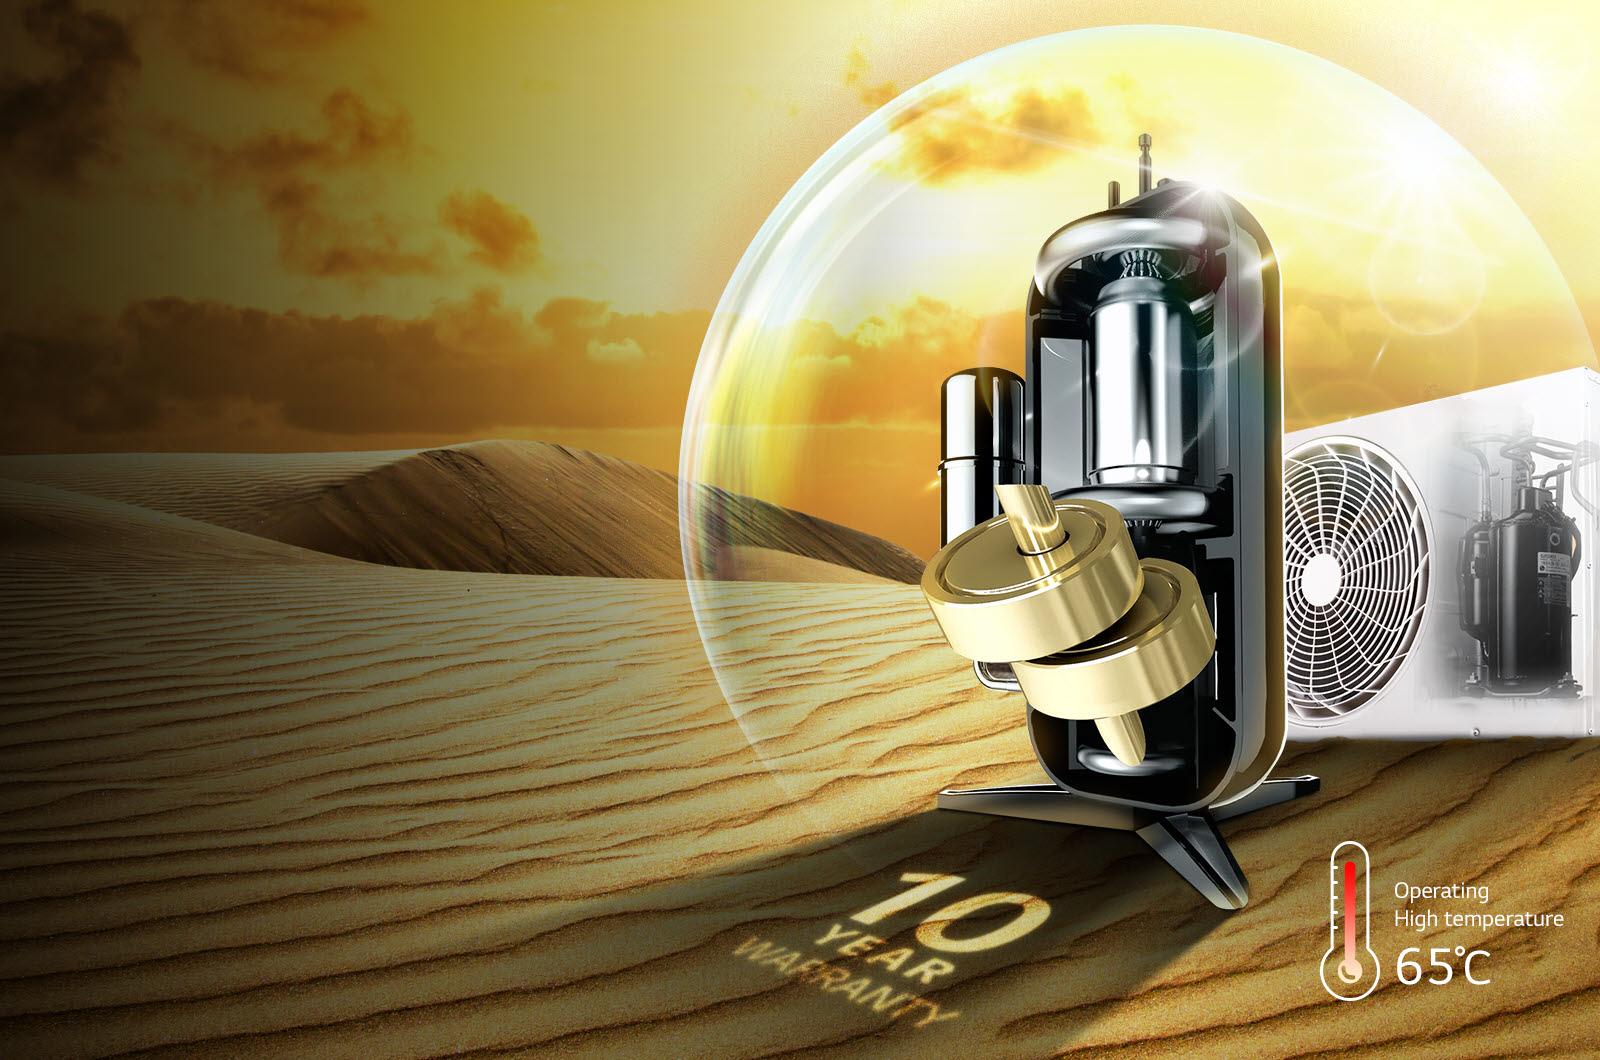 قیمت کولر گازی دوال اینورتر ال جی